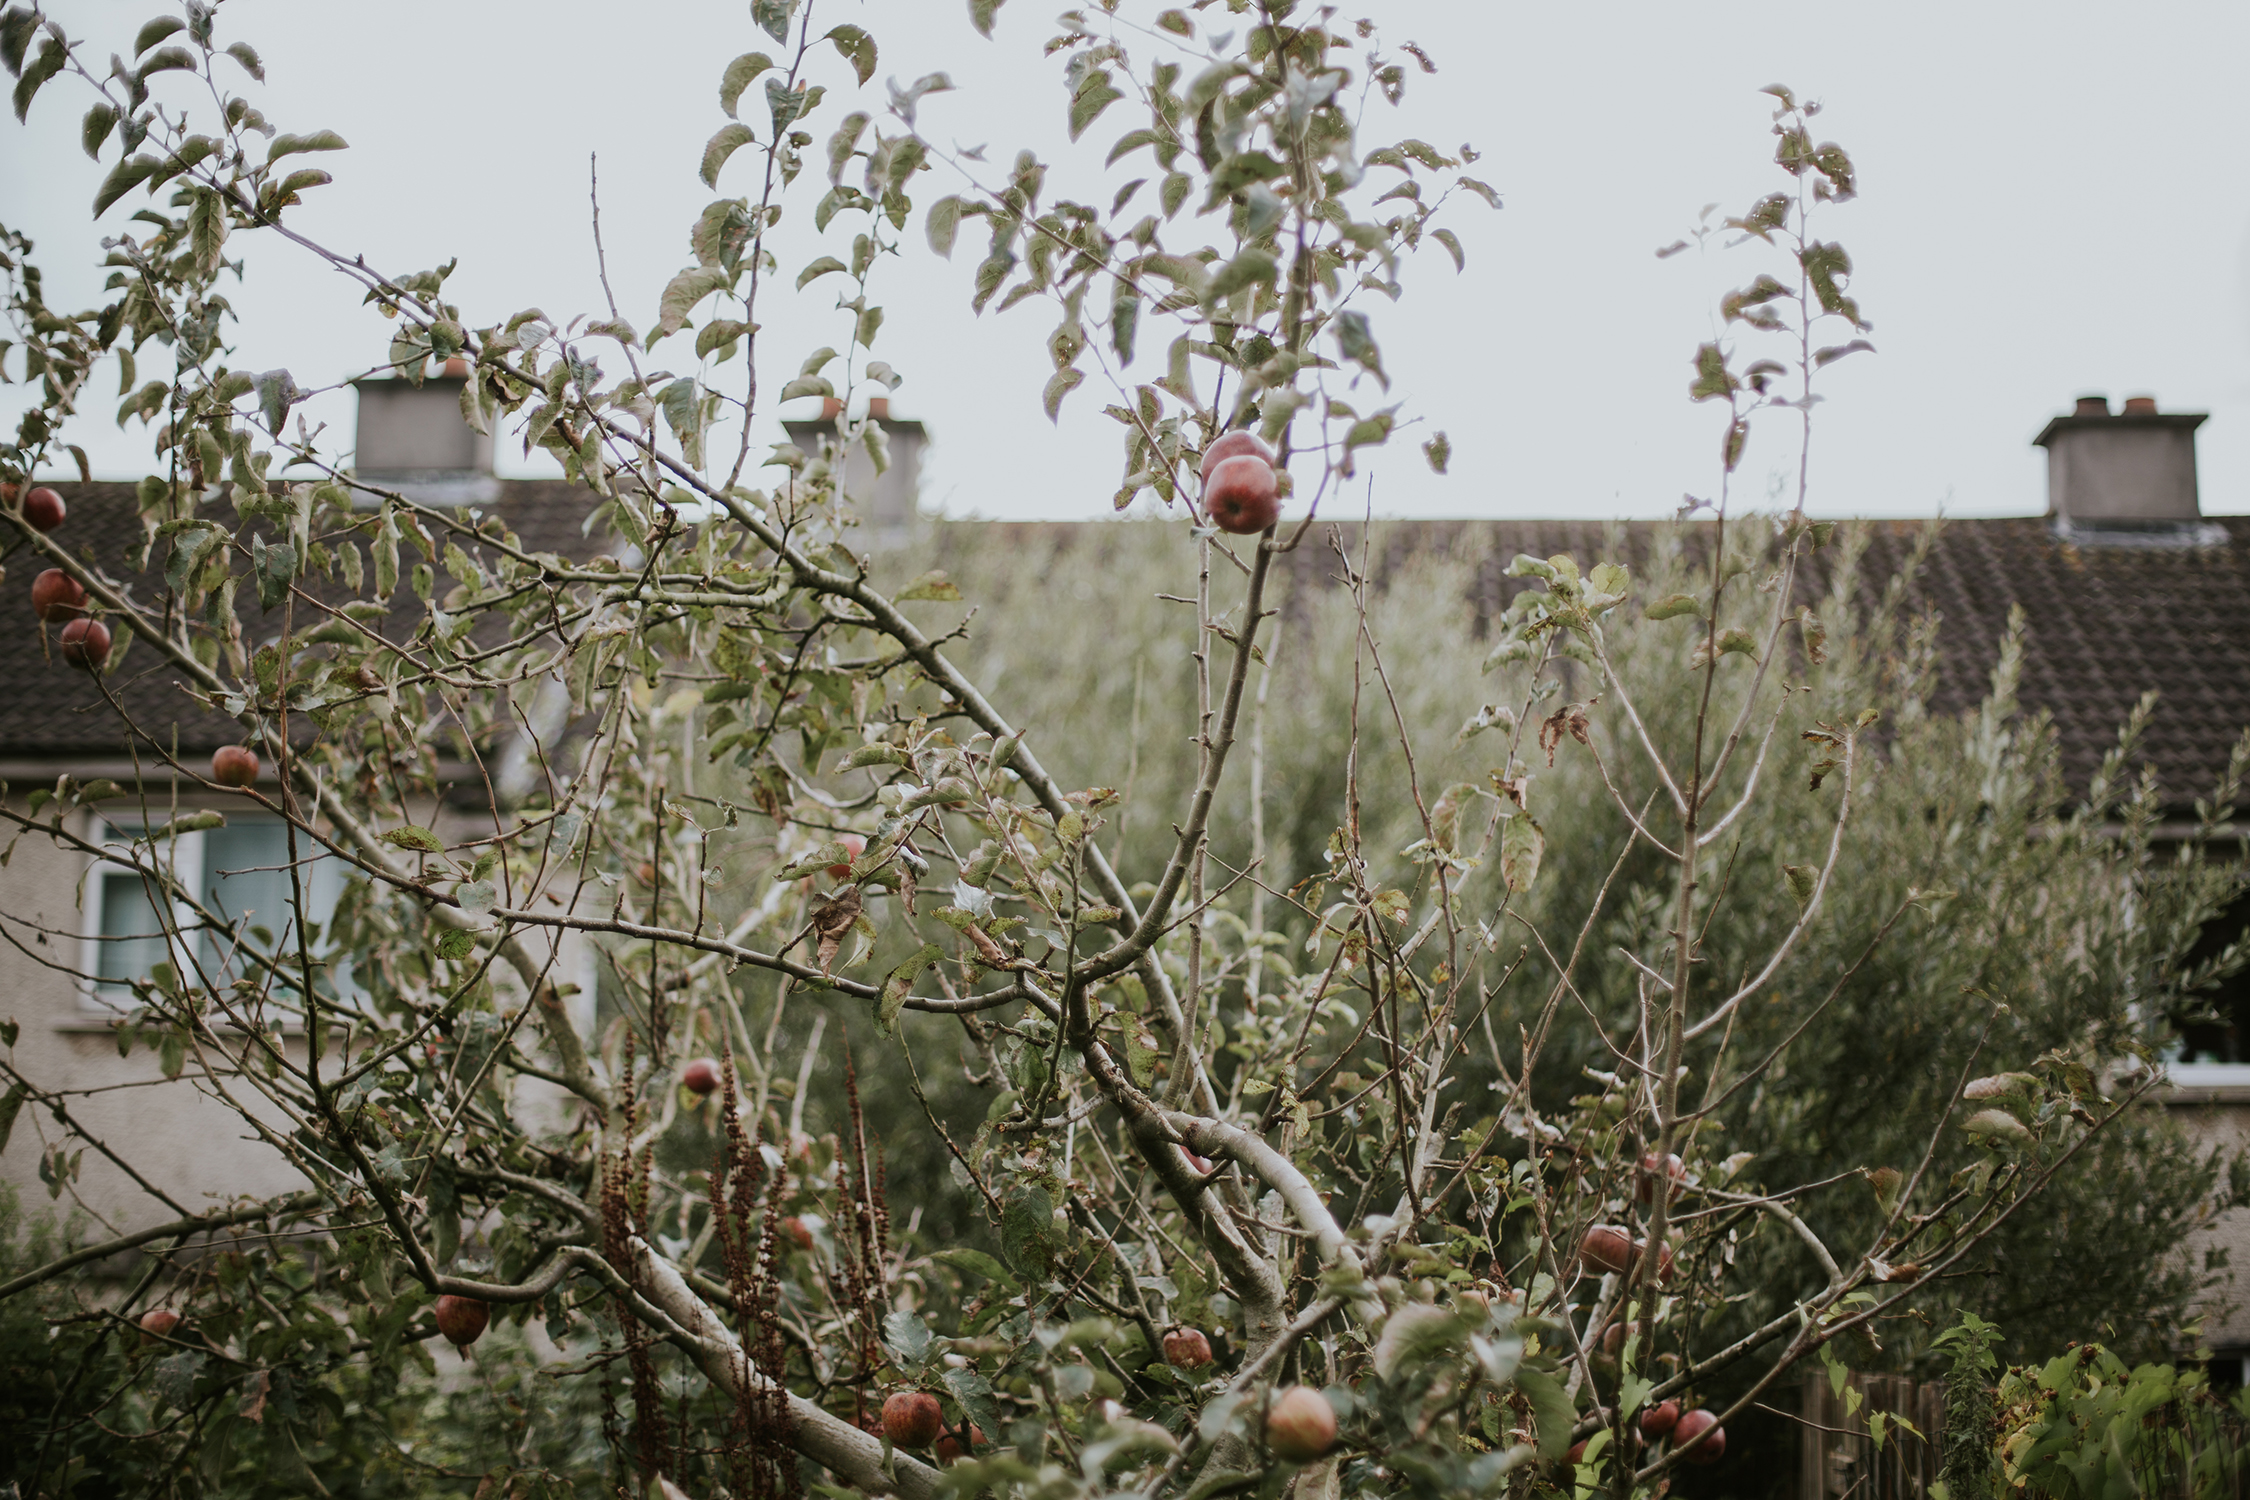 sue-slique photographer, dublin wedding photographer, family photographer in dublin, portrait photographer in wexford